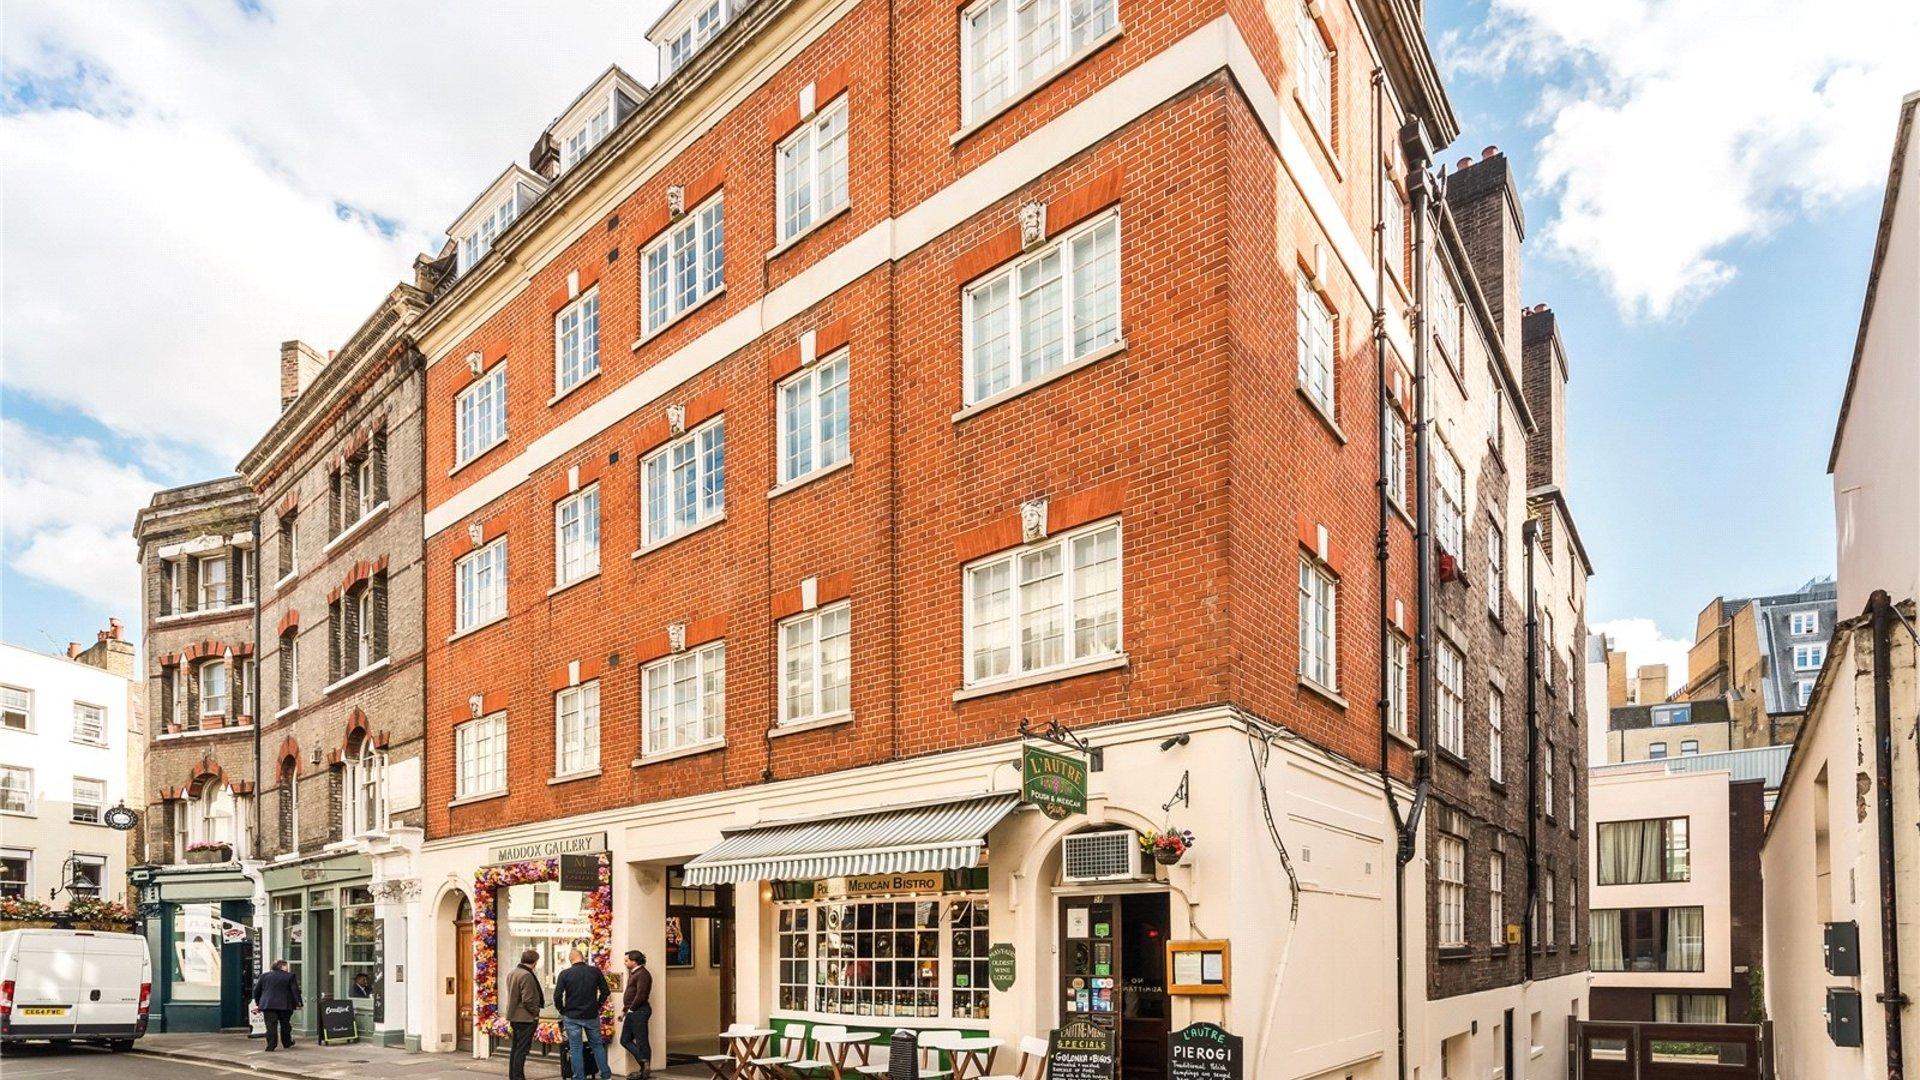 Shepherd Street, Mayfair